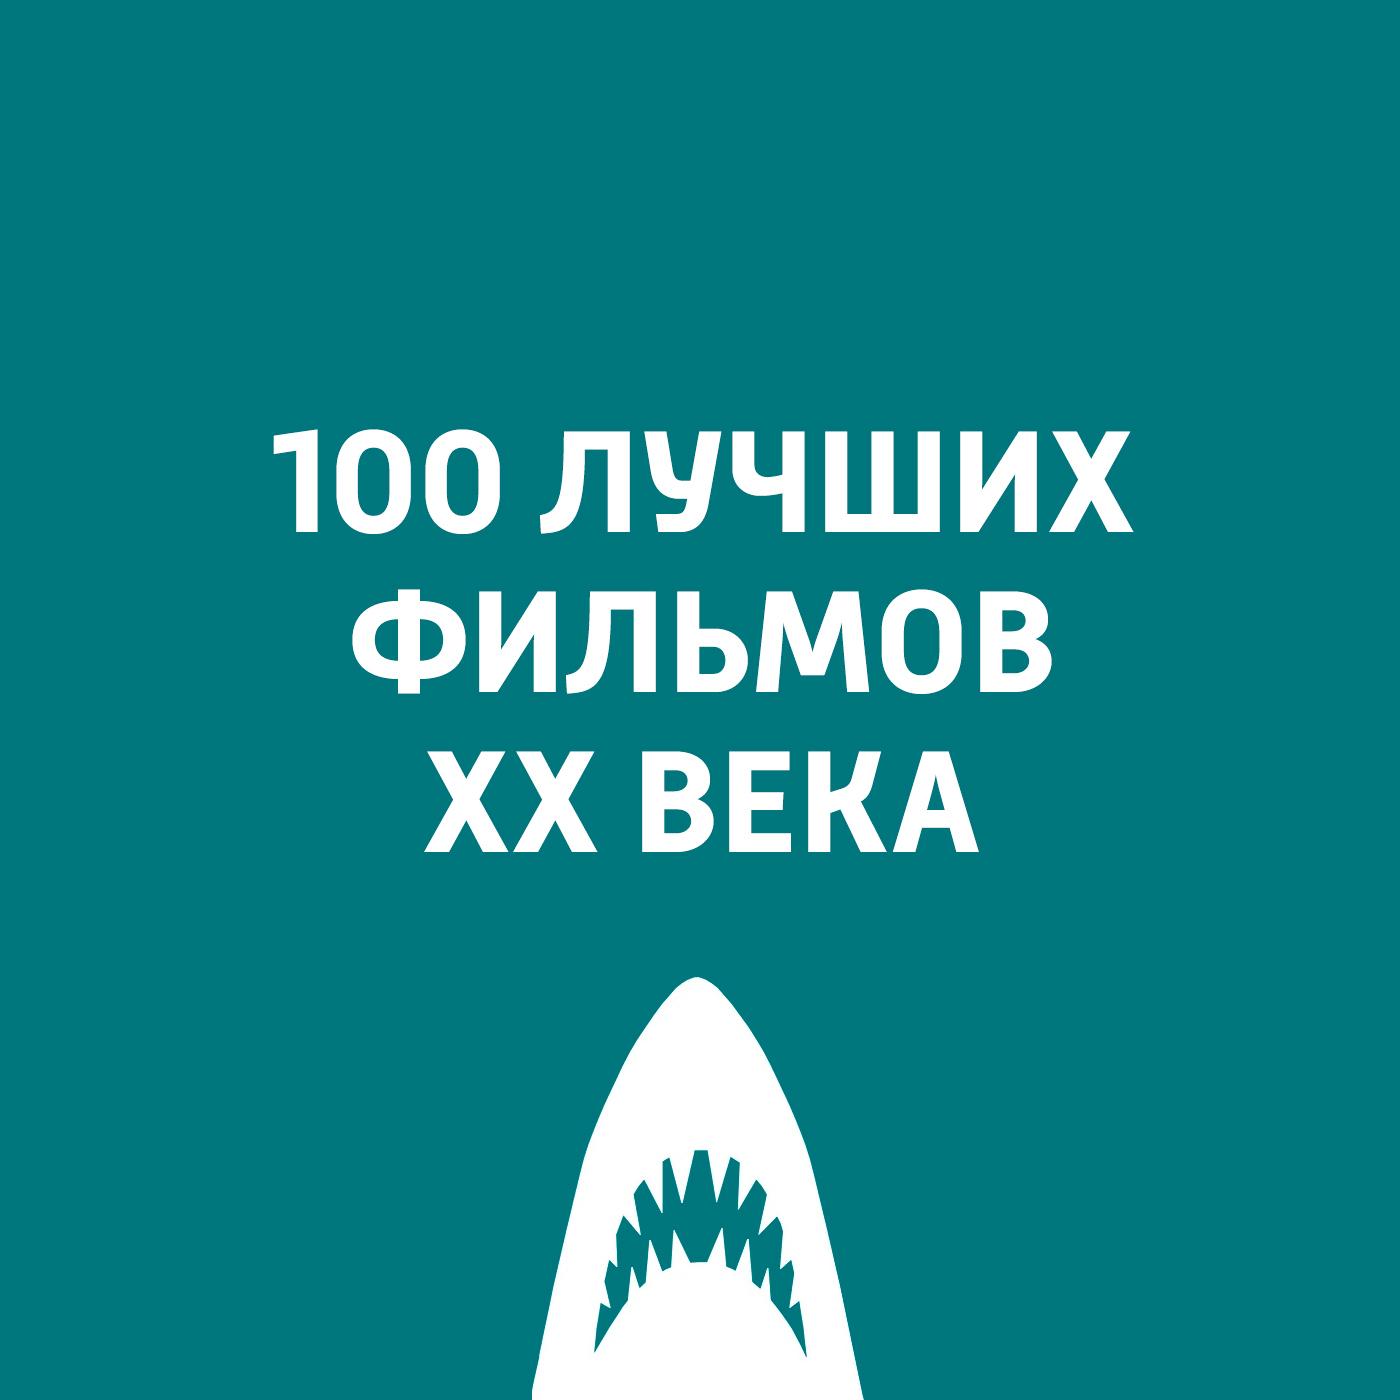 Антон Долин Криминальное чтиво антон долин цунами 3d